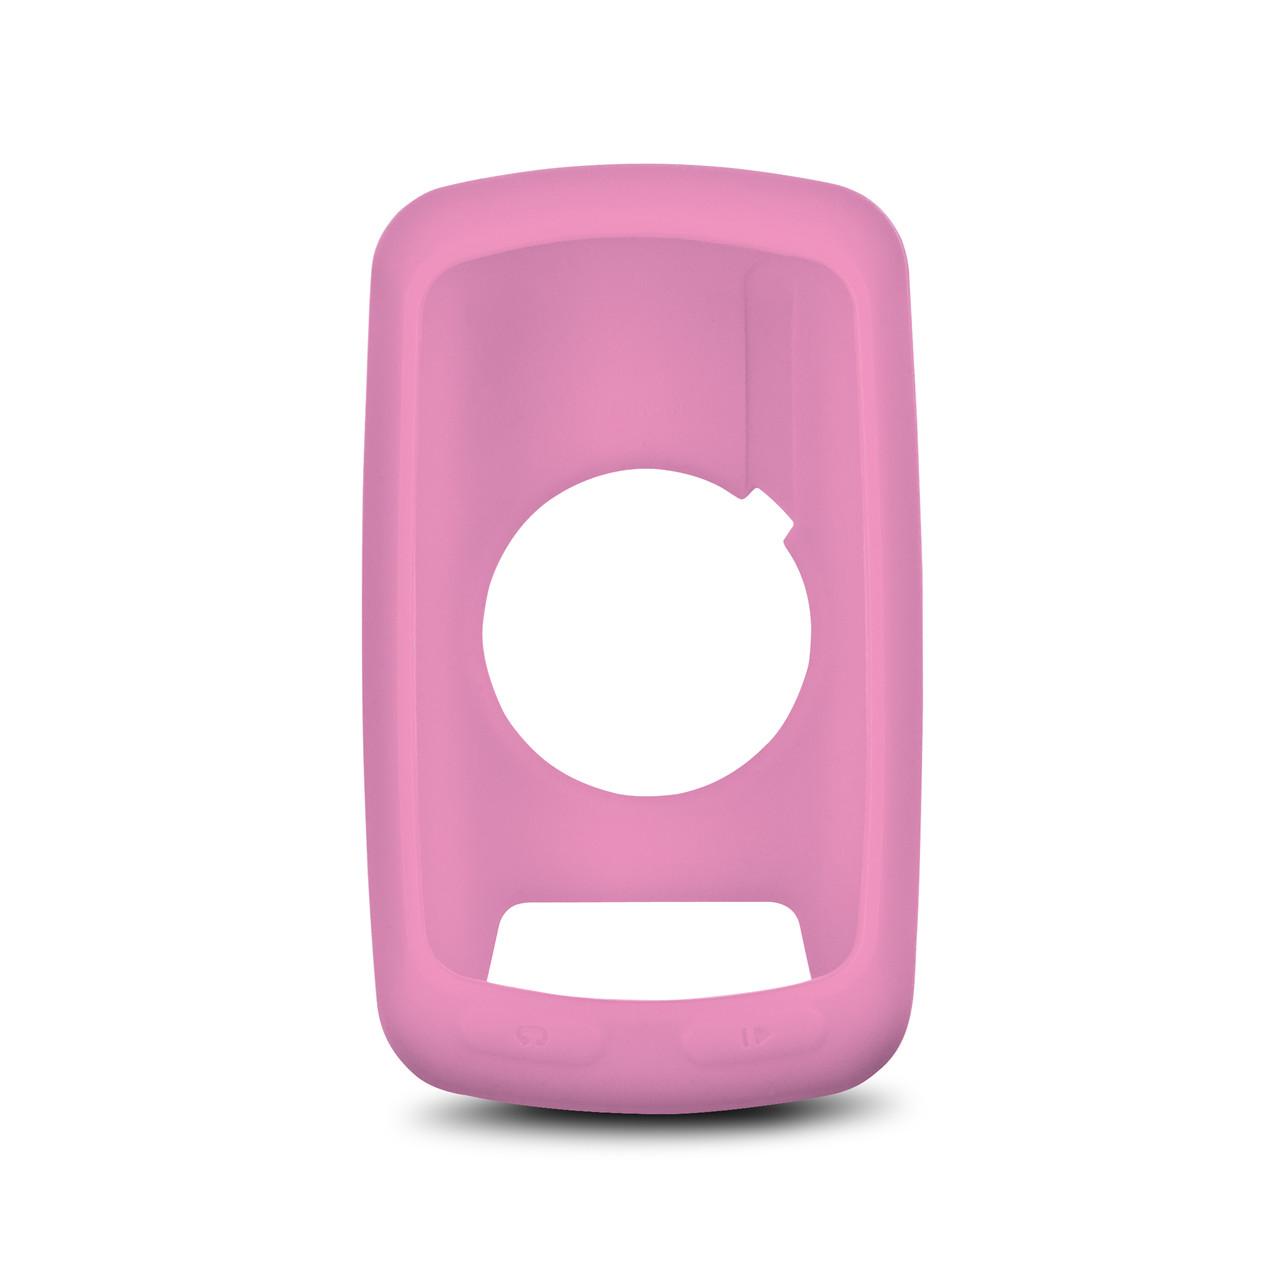 Garmin Edge 810 Silicone Cover (Pink)